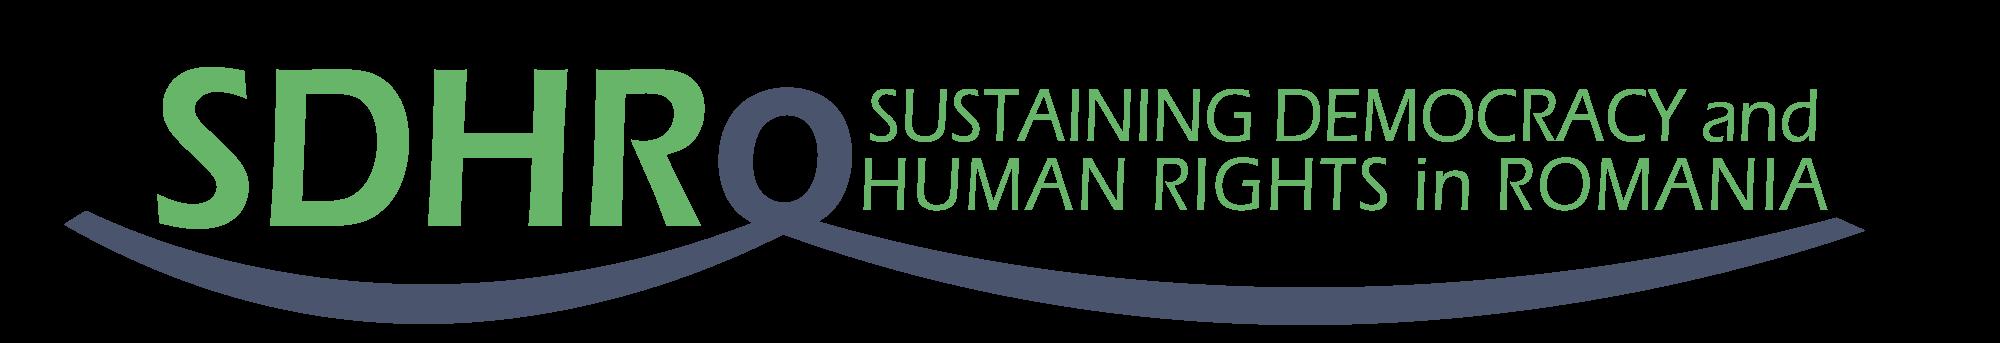 Asociația Sustaining Democracy and Human Rights in Romania logo